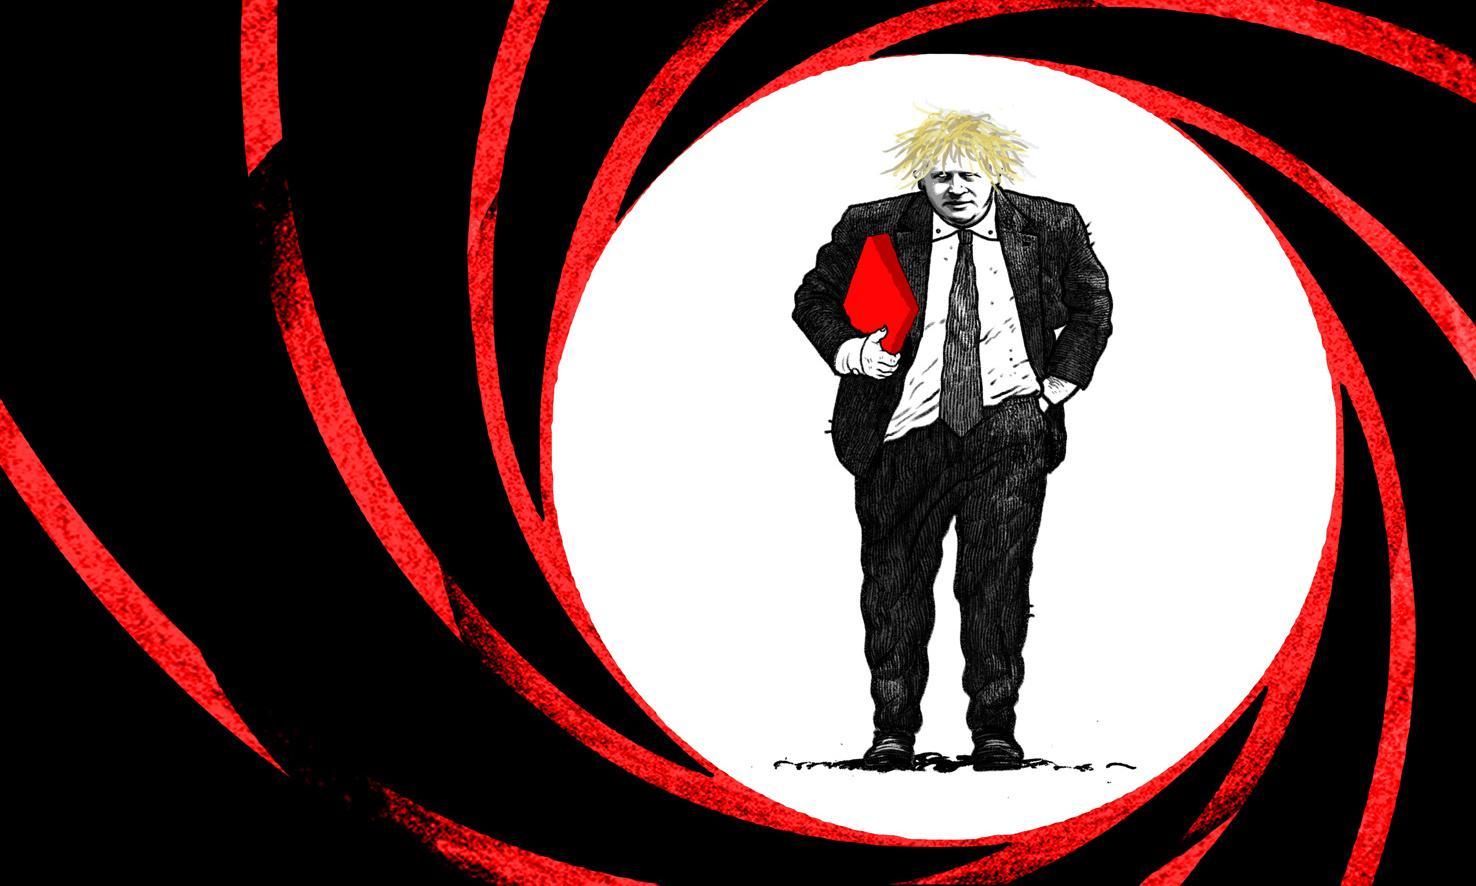 Boris, this Churchill fetish isn't your finest hour...